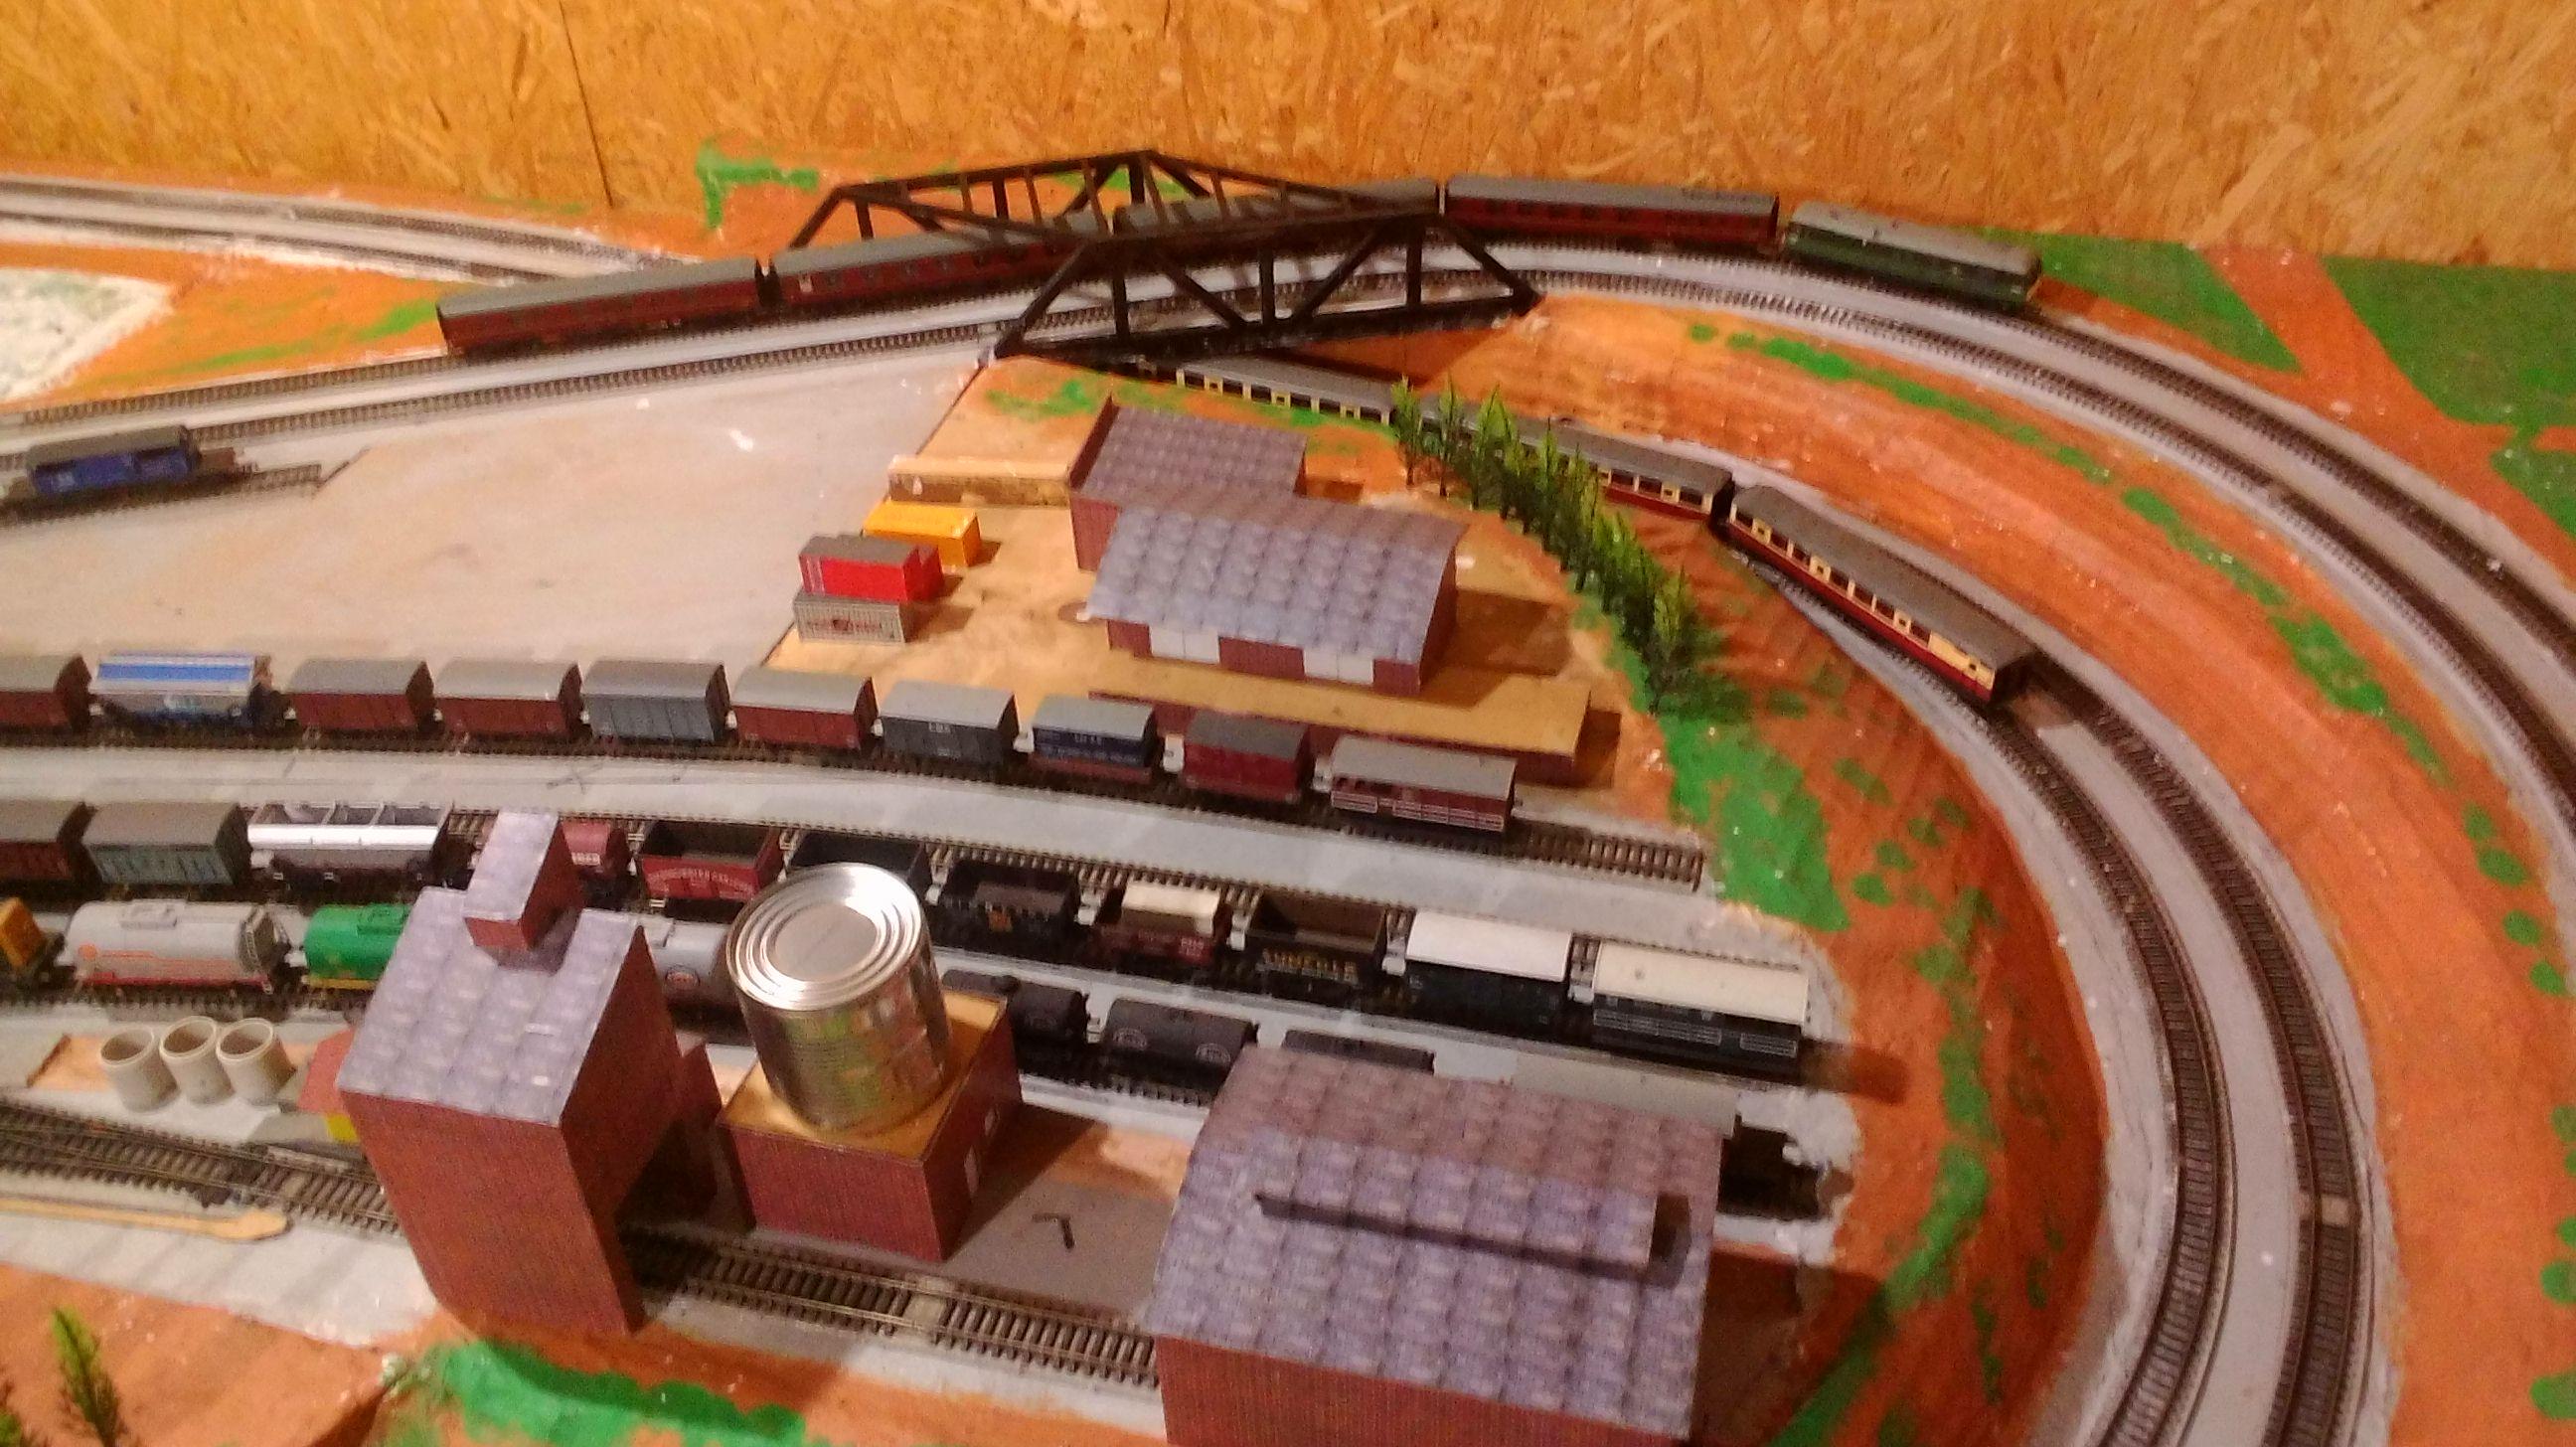 Railroad Line Forums | Model train scenery, Model trains